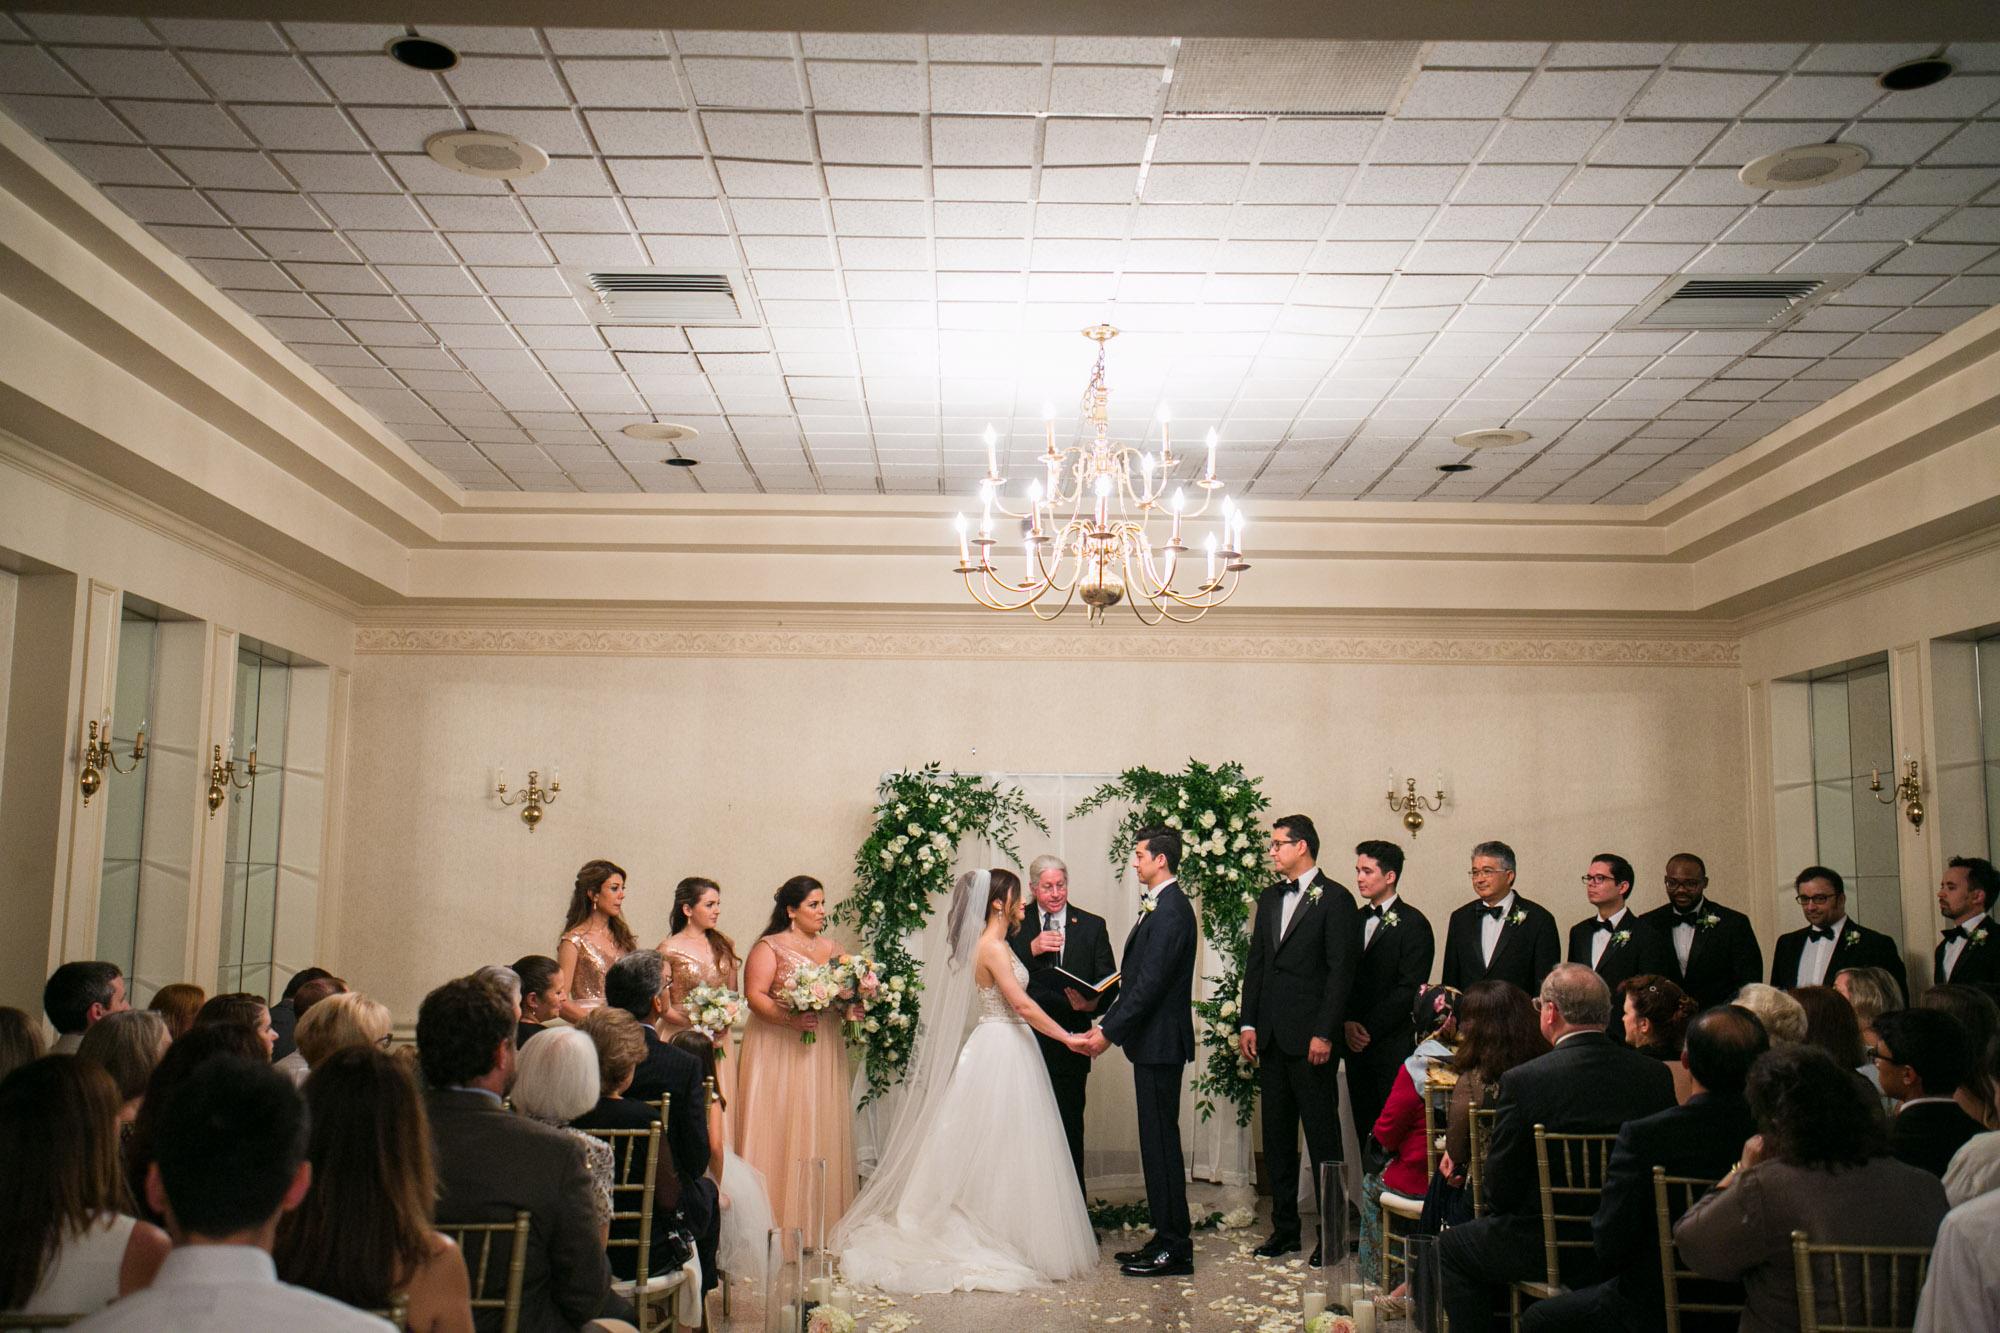 sylvania-country-club-wedding-photos-136.jpg